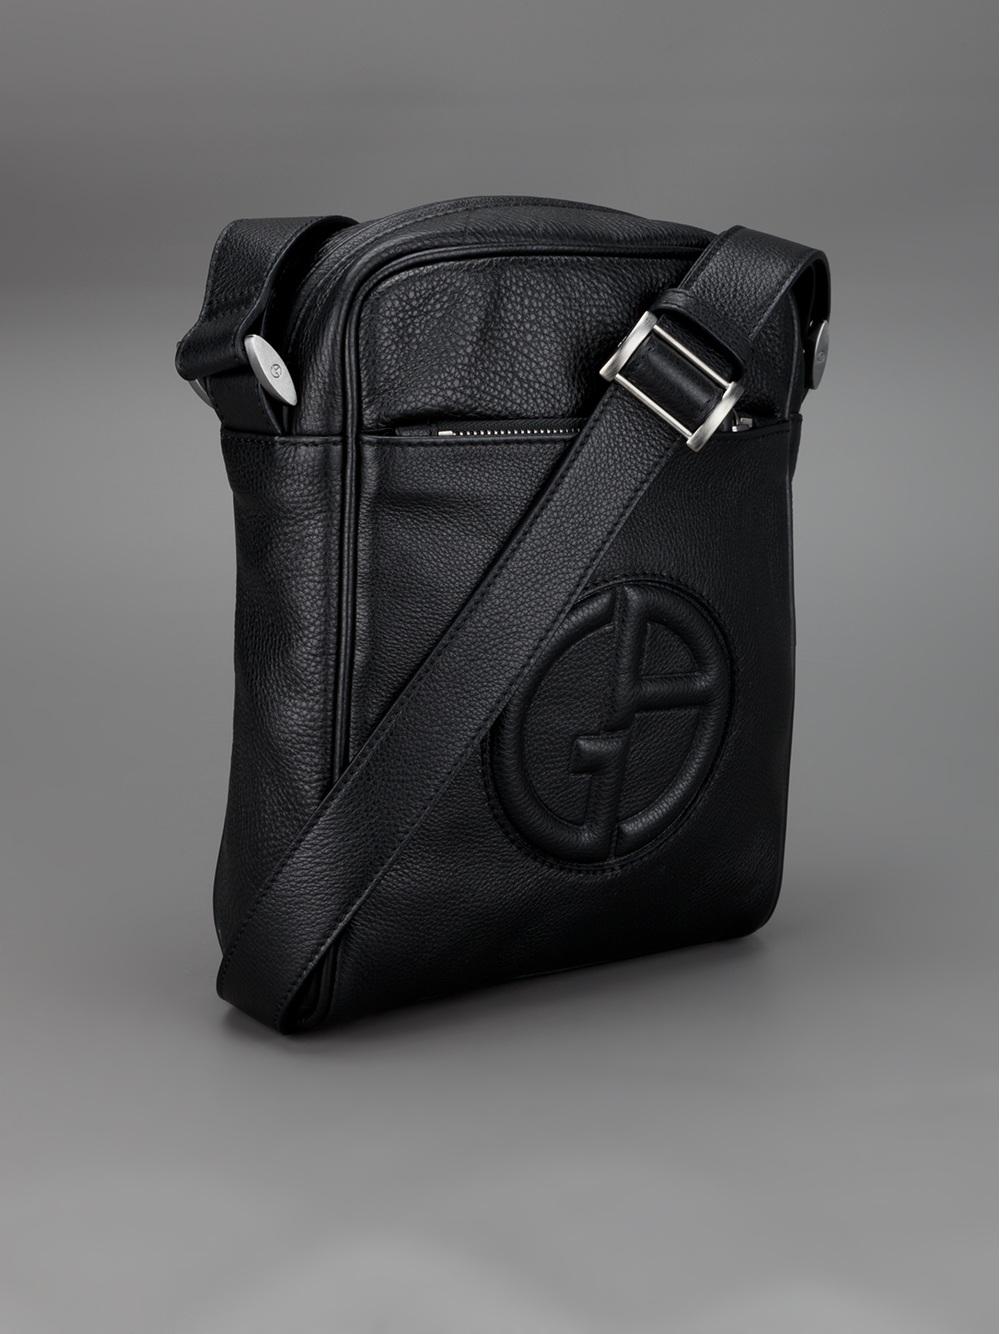 9dfaa7cef1 ... Bags  reputable site d5ca4 582b7 Lyst giorgio armani raised logo  messenger bag in black for men jpg ...